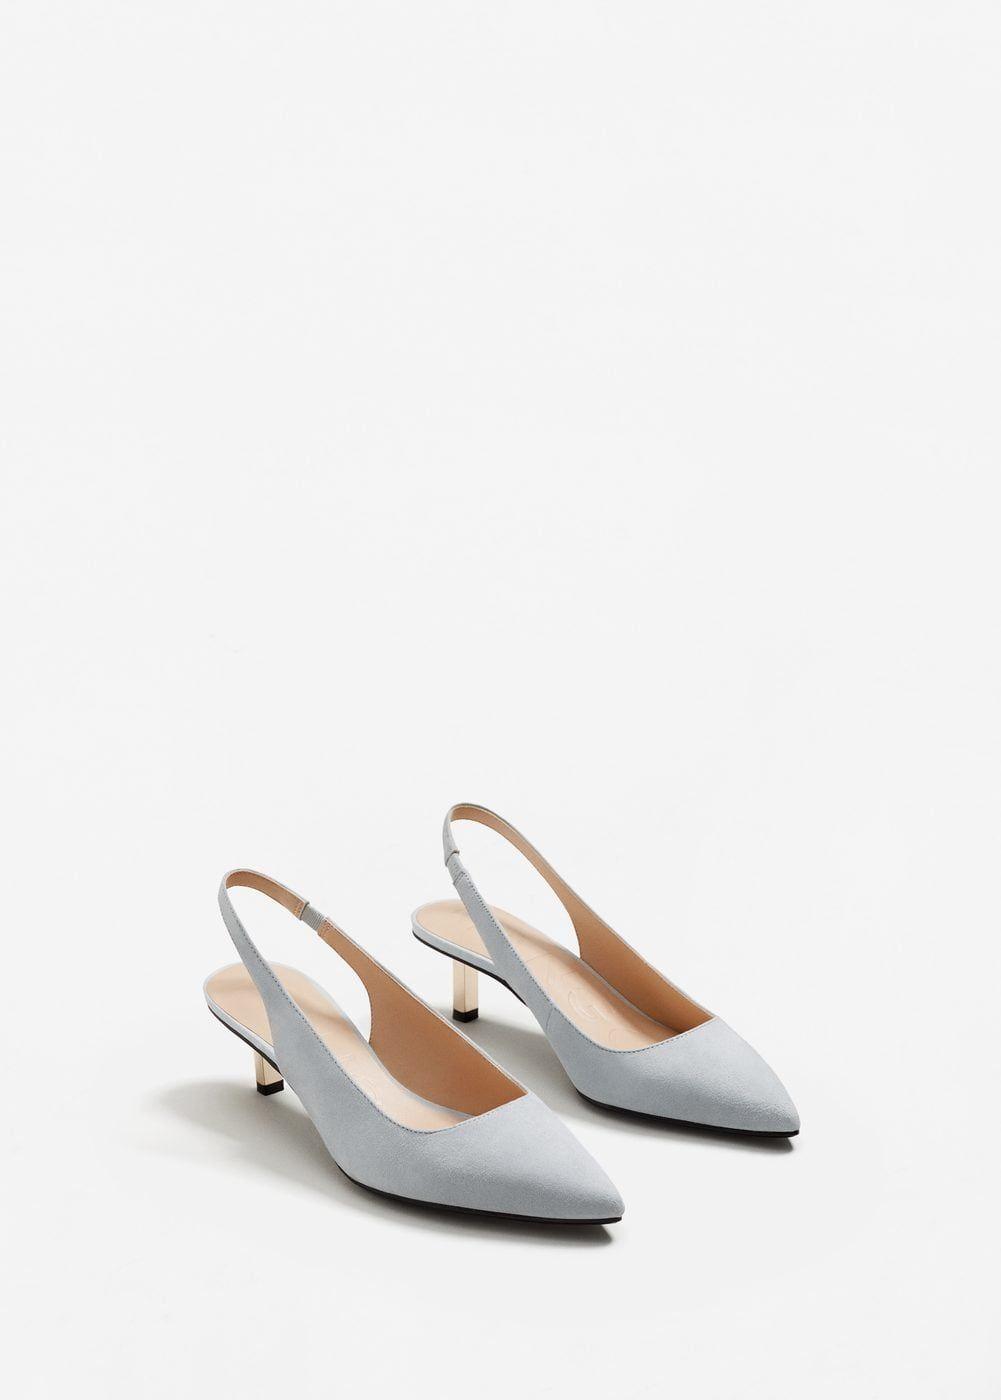 Kitten heel shoes, Slingback shoes